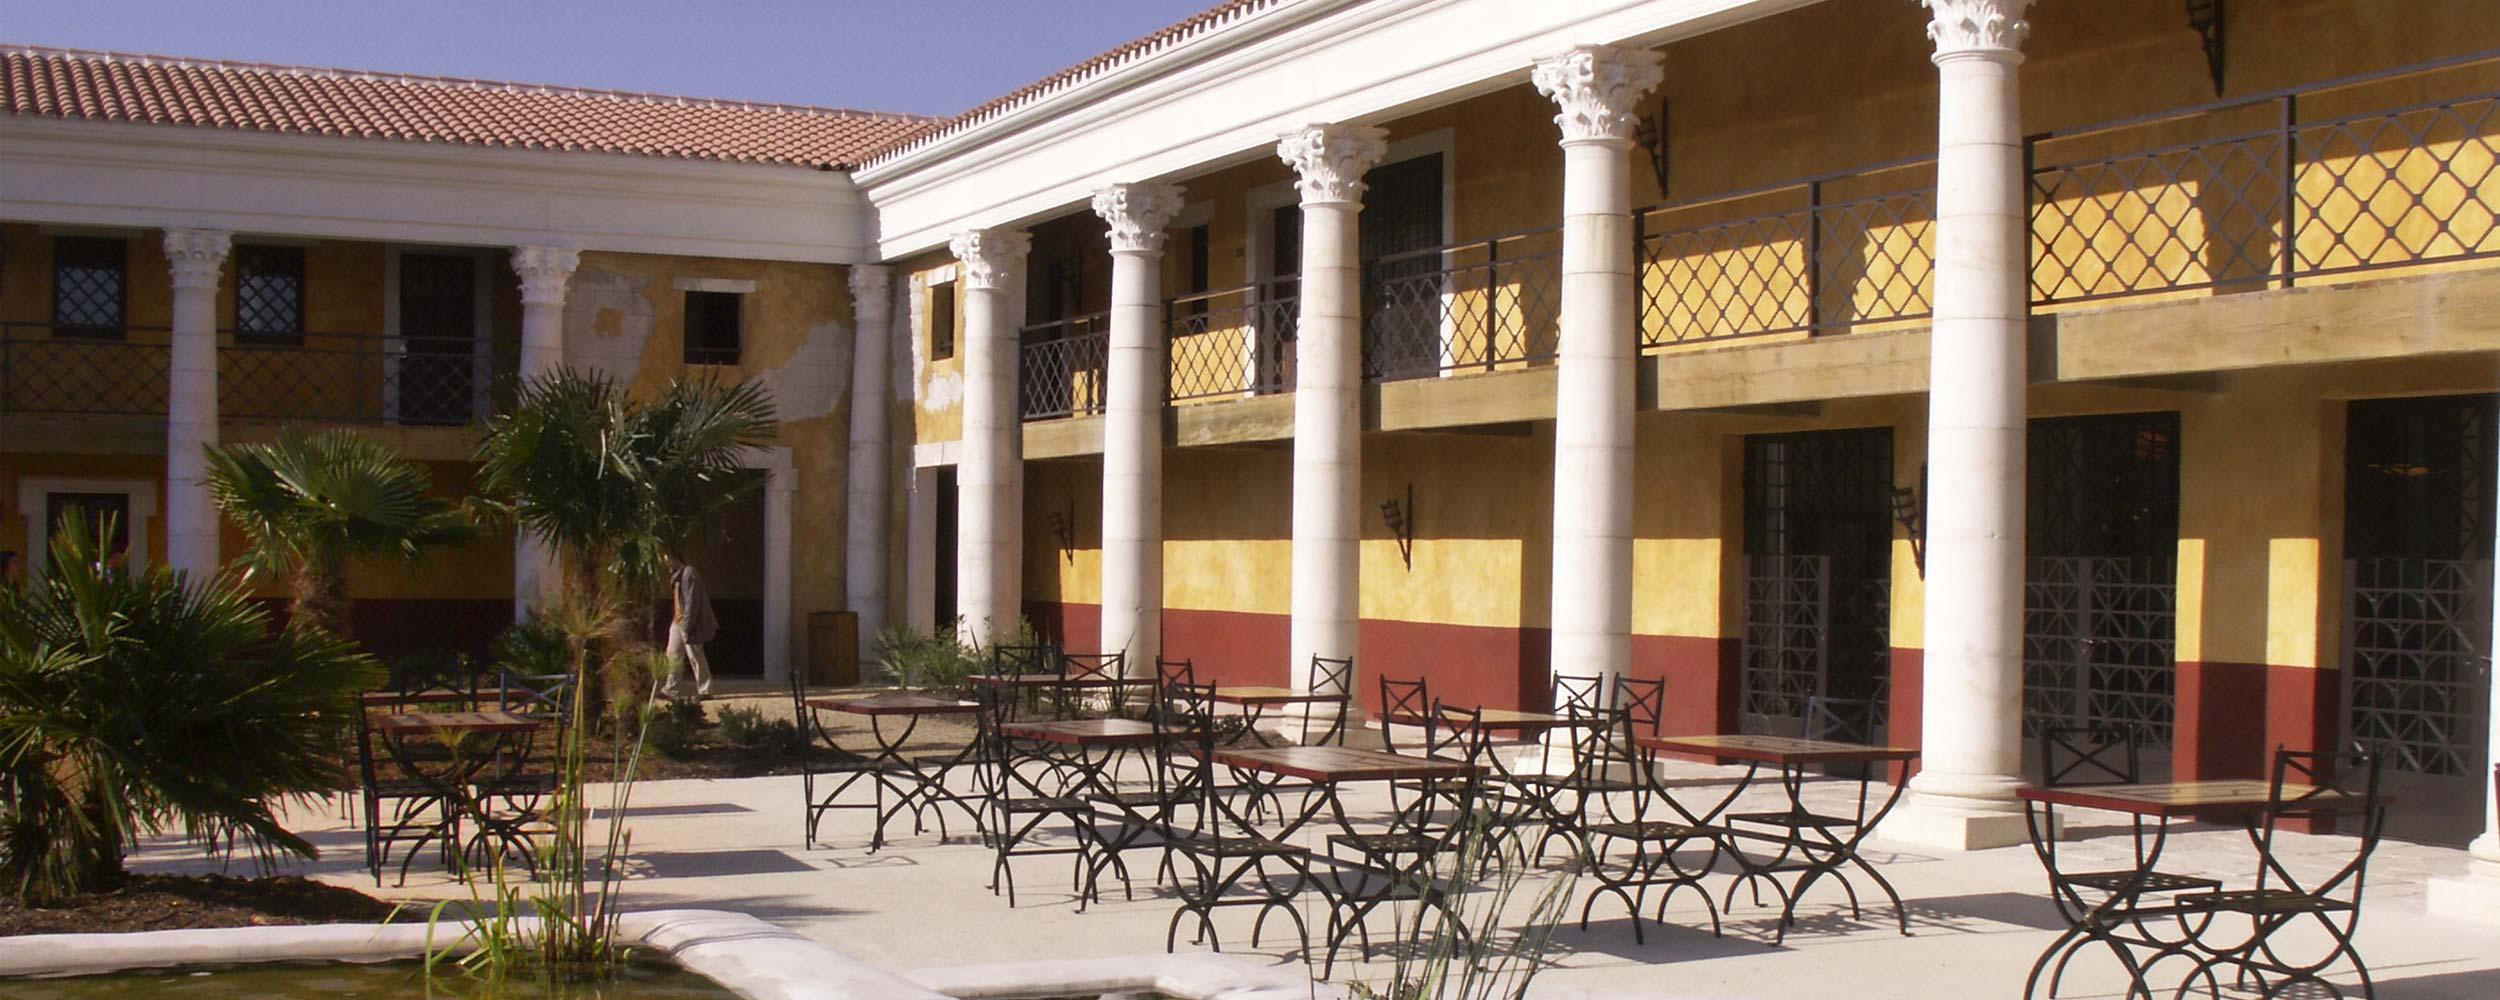 6 k puy du fou villa gallo tourisme b timents - Hotel la villa gallo romaine puy du fou ...